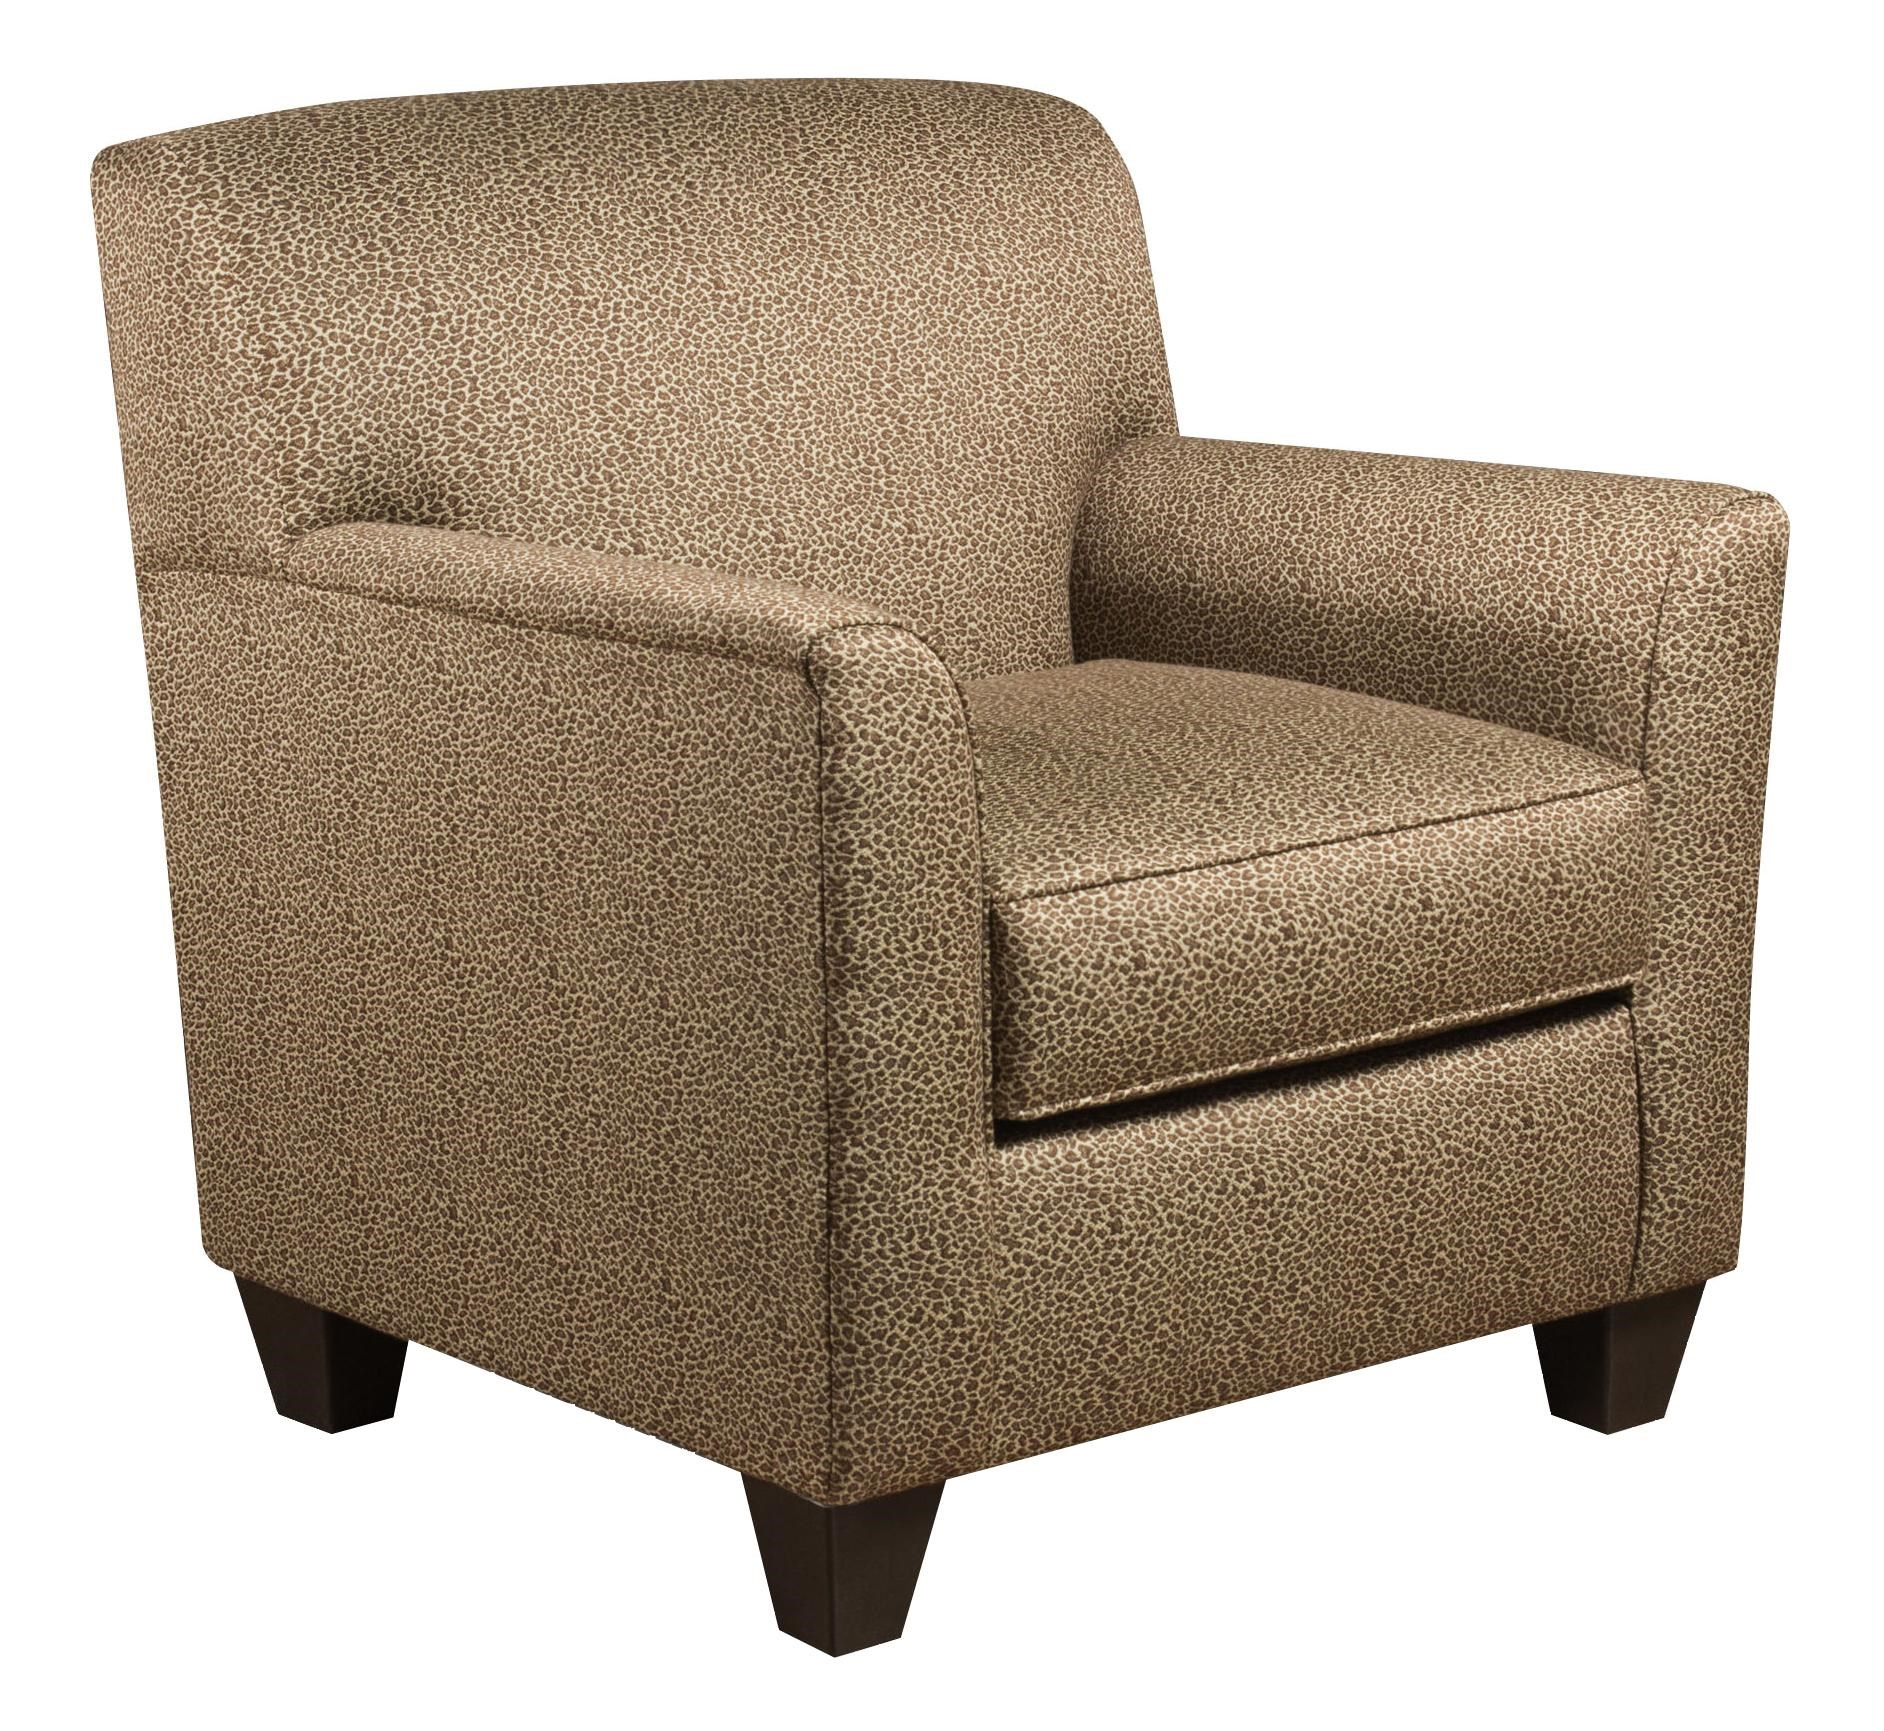 Merveilleux American Furniture Accent ChairsChair